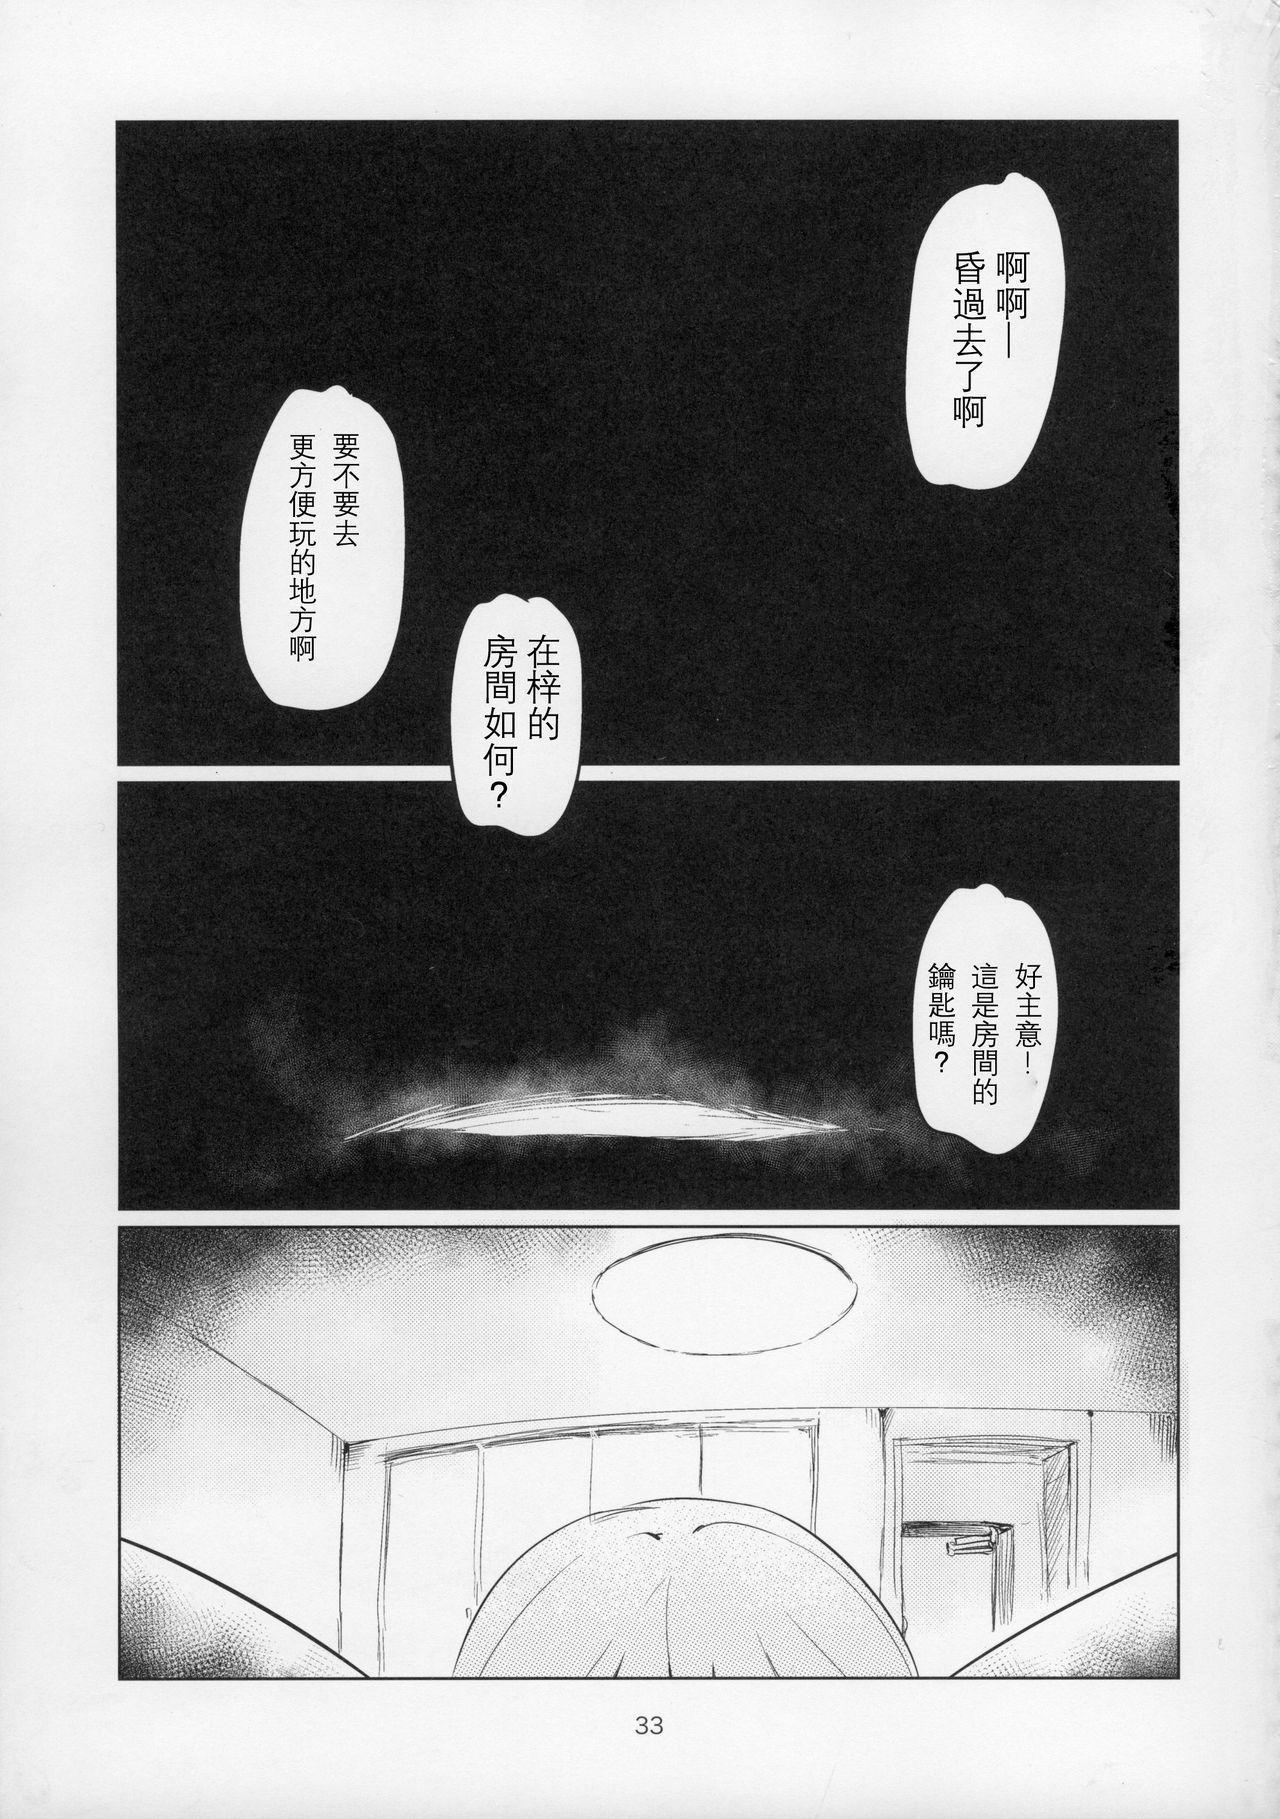 (C91) [Yakitate Jamaica (Aomushi)] Sawakan - Futanari Usagi-san no Sawa Azusa Kairaku Choukyou Hon (Girls und Panzer) [Chinese] [沒有漢化] 33